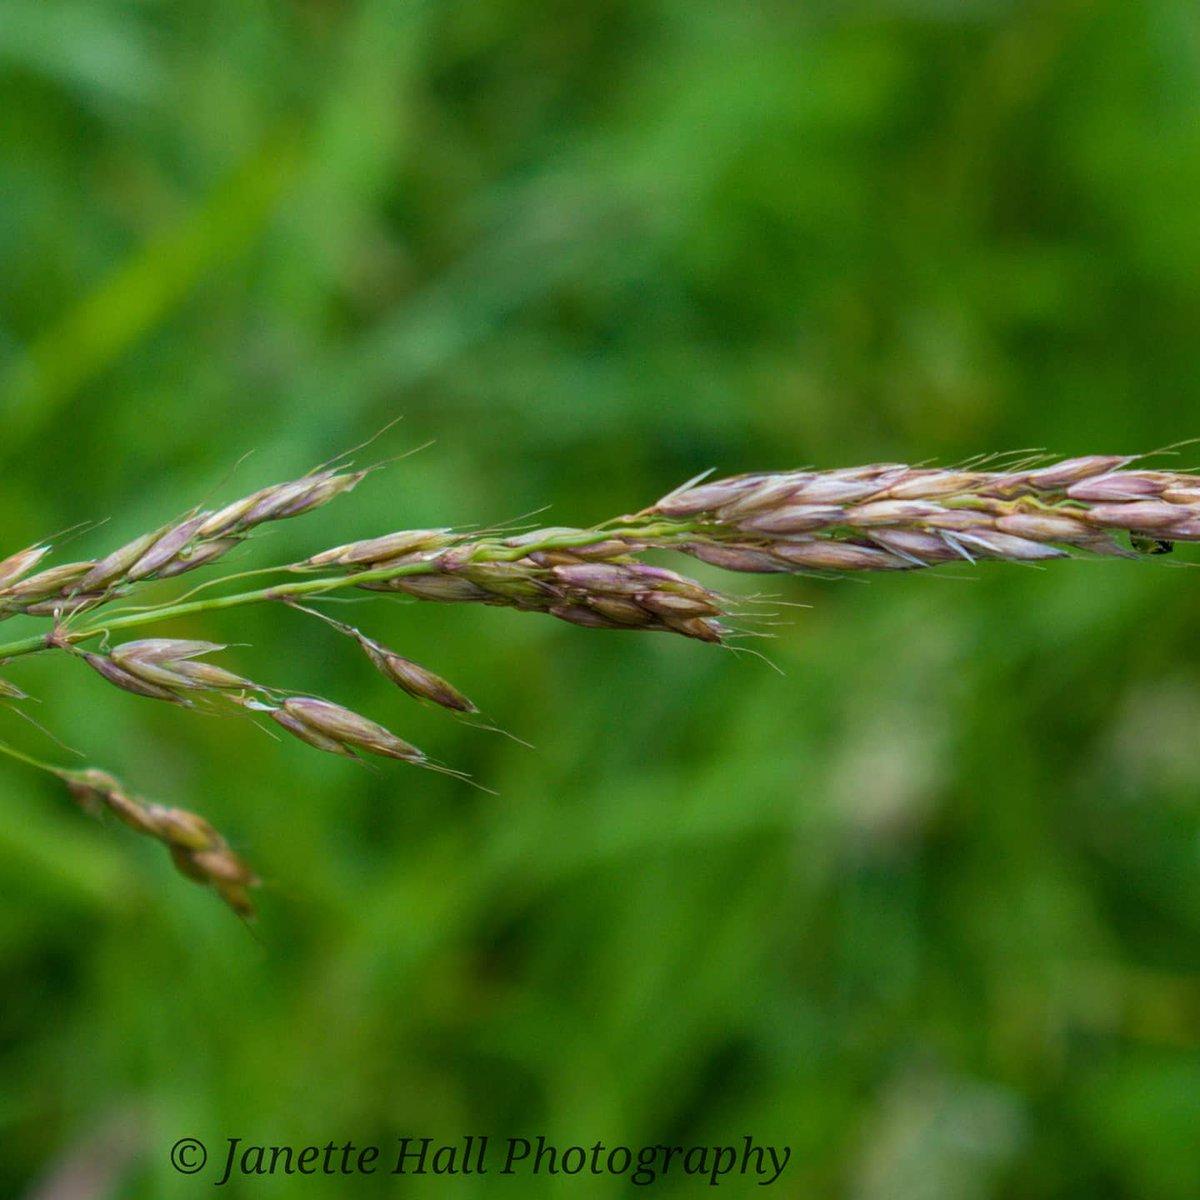 Wheat in the fields 🌾 #wheat #farmersfields #fields #preston #Lancashire #nature #naturephotography #uk #ukphotography #uk_greatshots @BBCWthrWatchers @bbcweather @OwainWynEvans @DigitalCameraW @metoffice #loveukweather https://t.co/CCxuq2pMf6